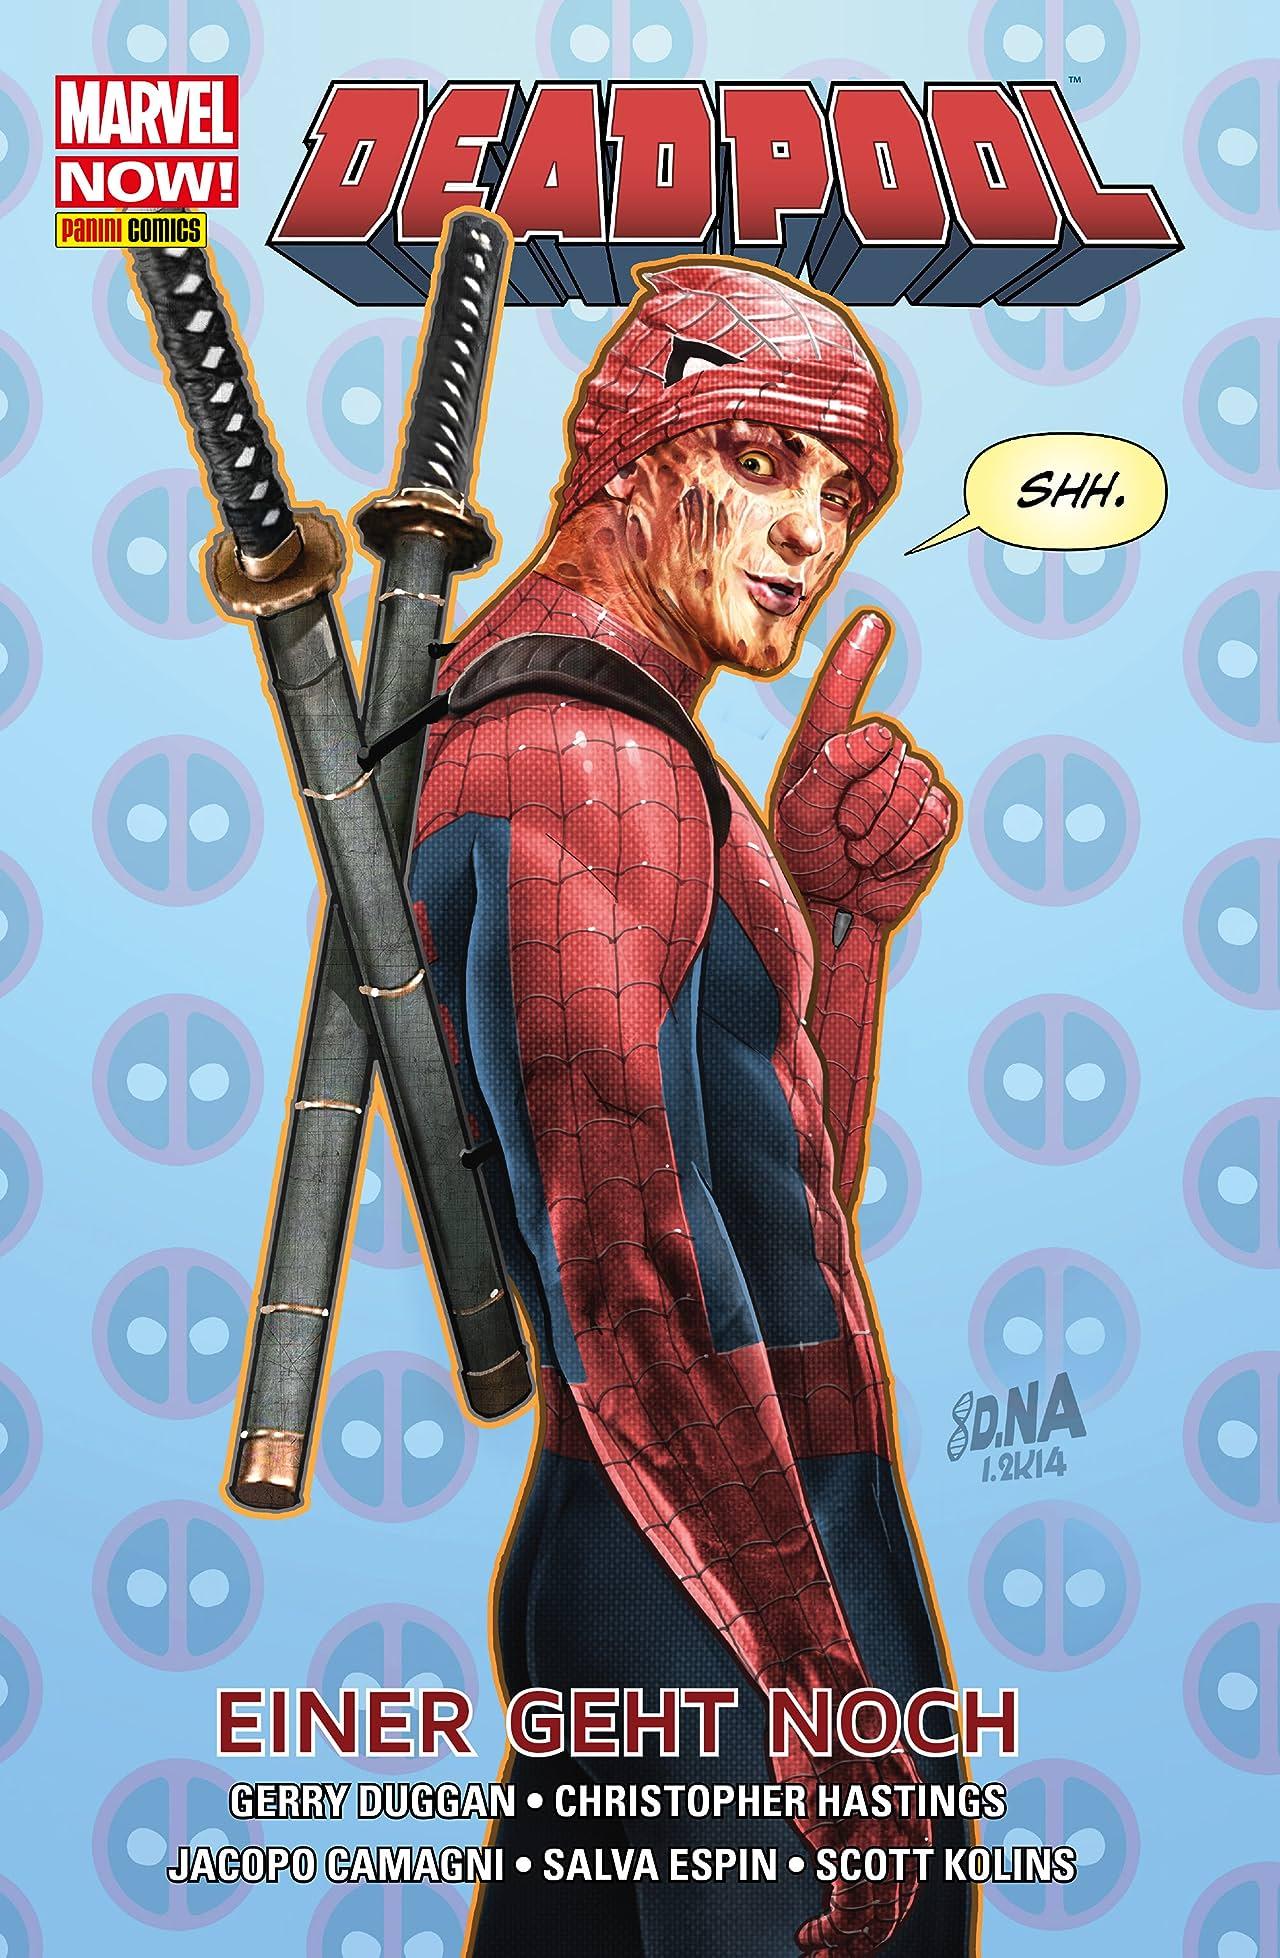 Marvel NOW! PB Deadpool Vol. 9: Einer geht noch